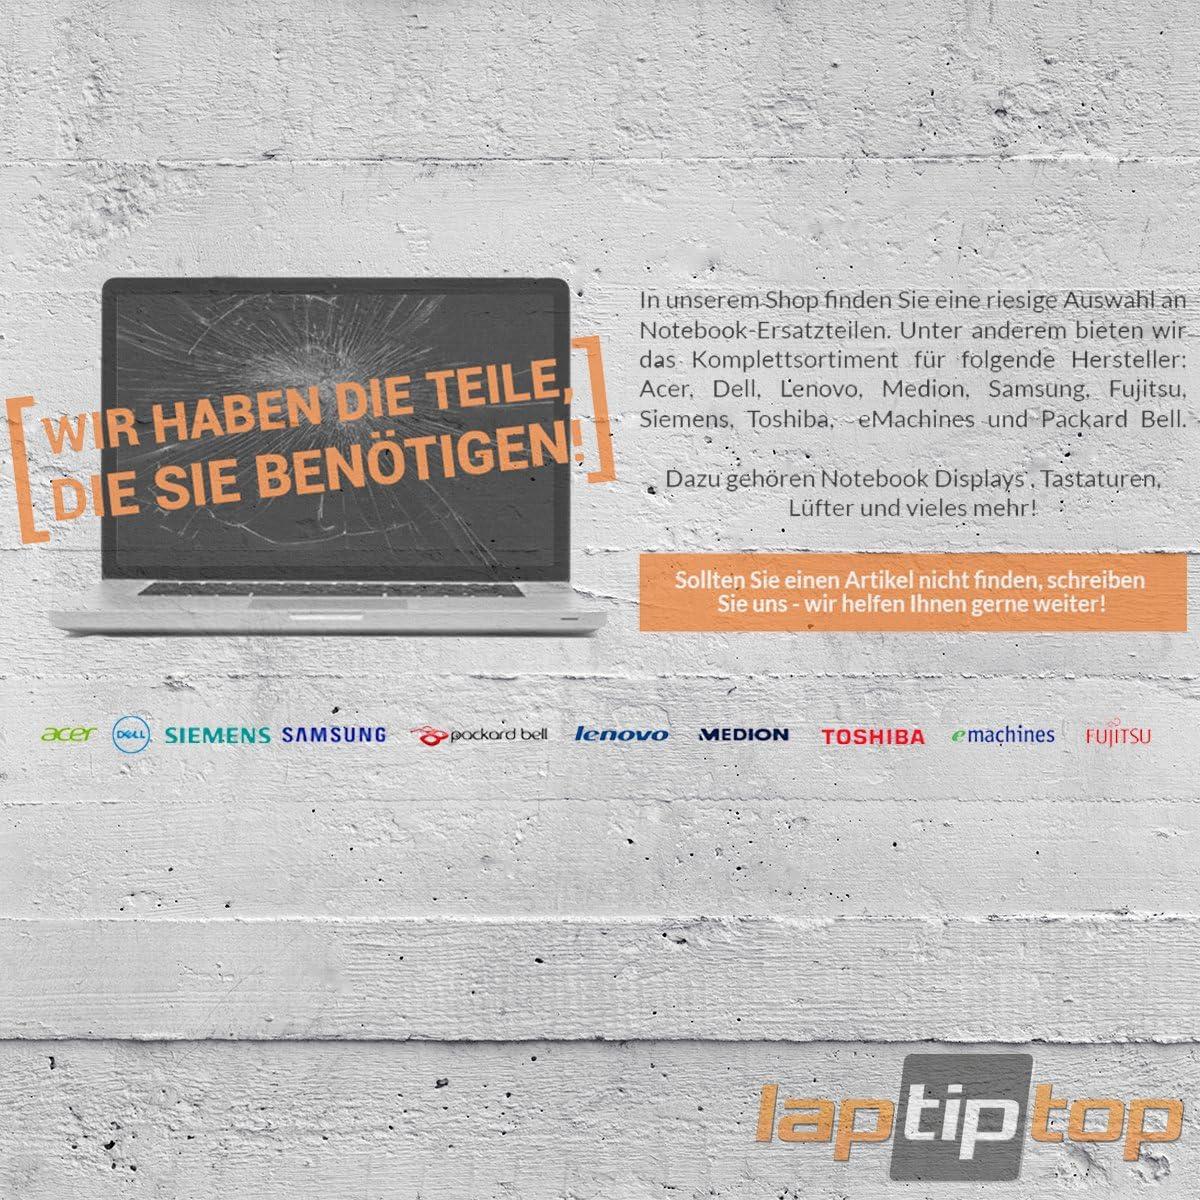 Laptiptop 15,6 LED Display 1920x1080 Full HD matt Ersatz f/ür N156HCE-GN1 Rev C1 72/% Gamut 1000:1 Contrast